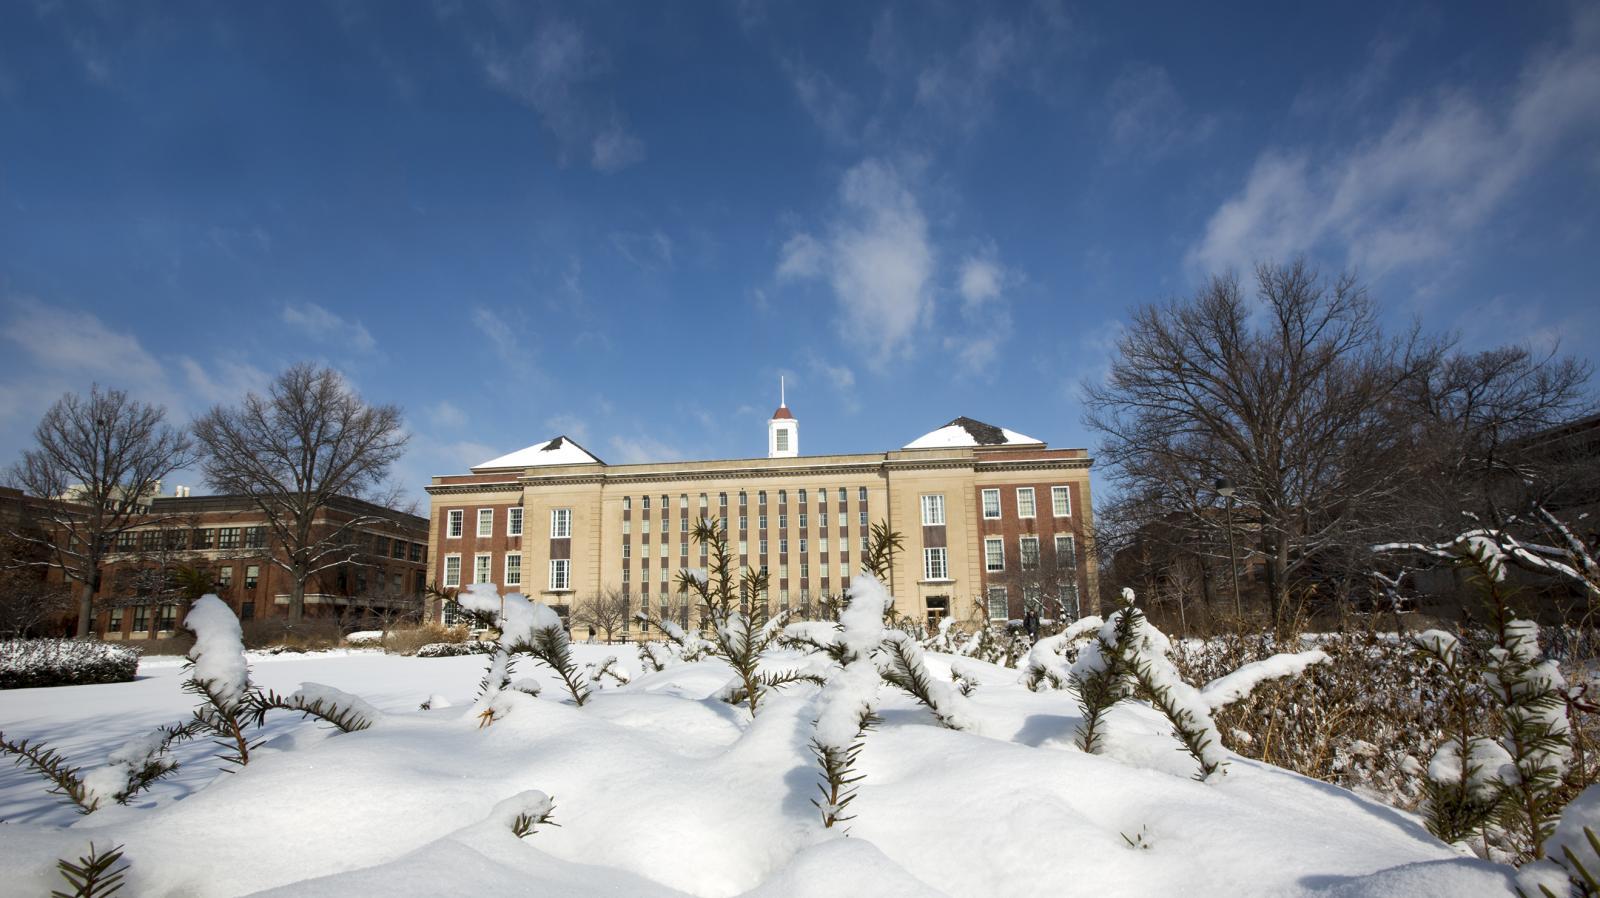 UNL Campus during the winter